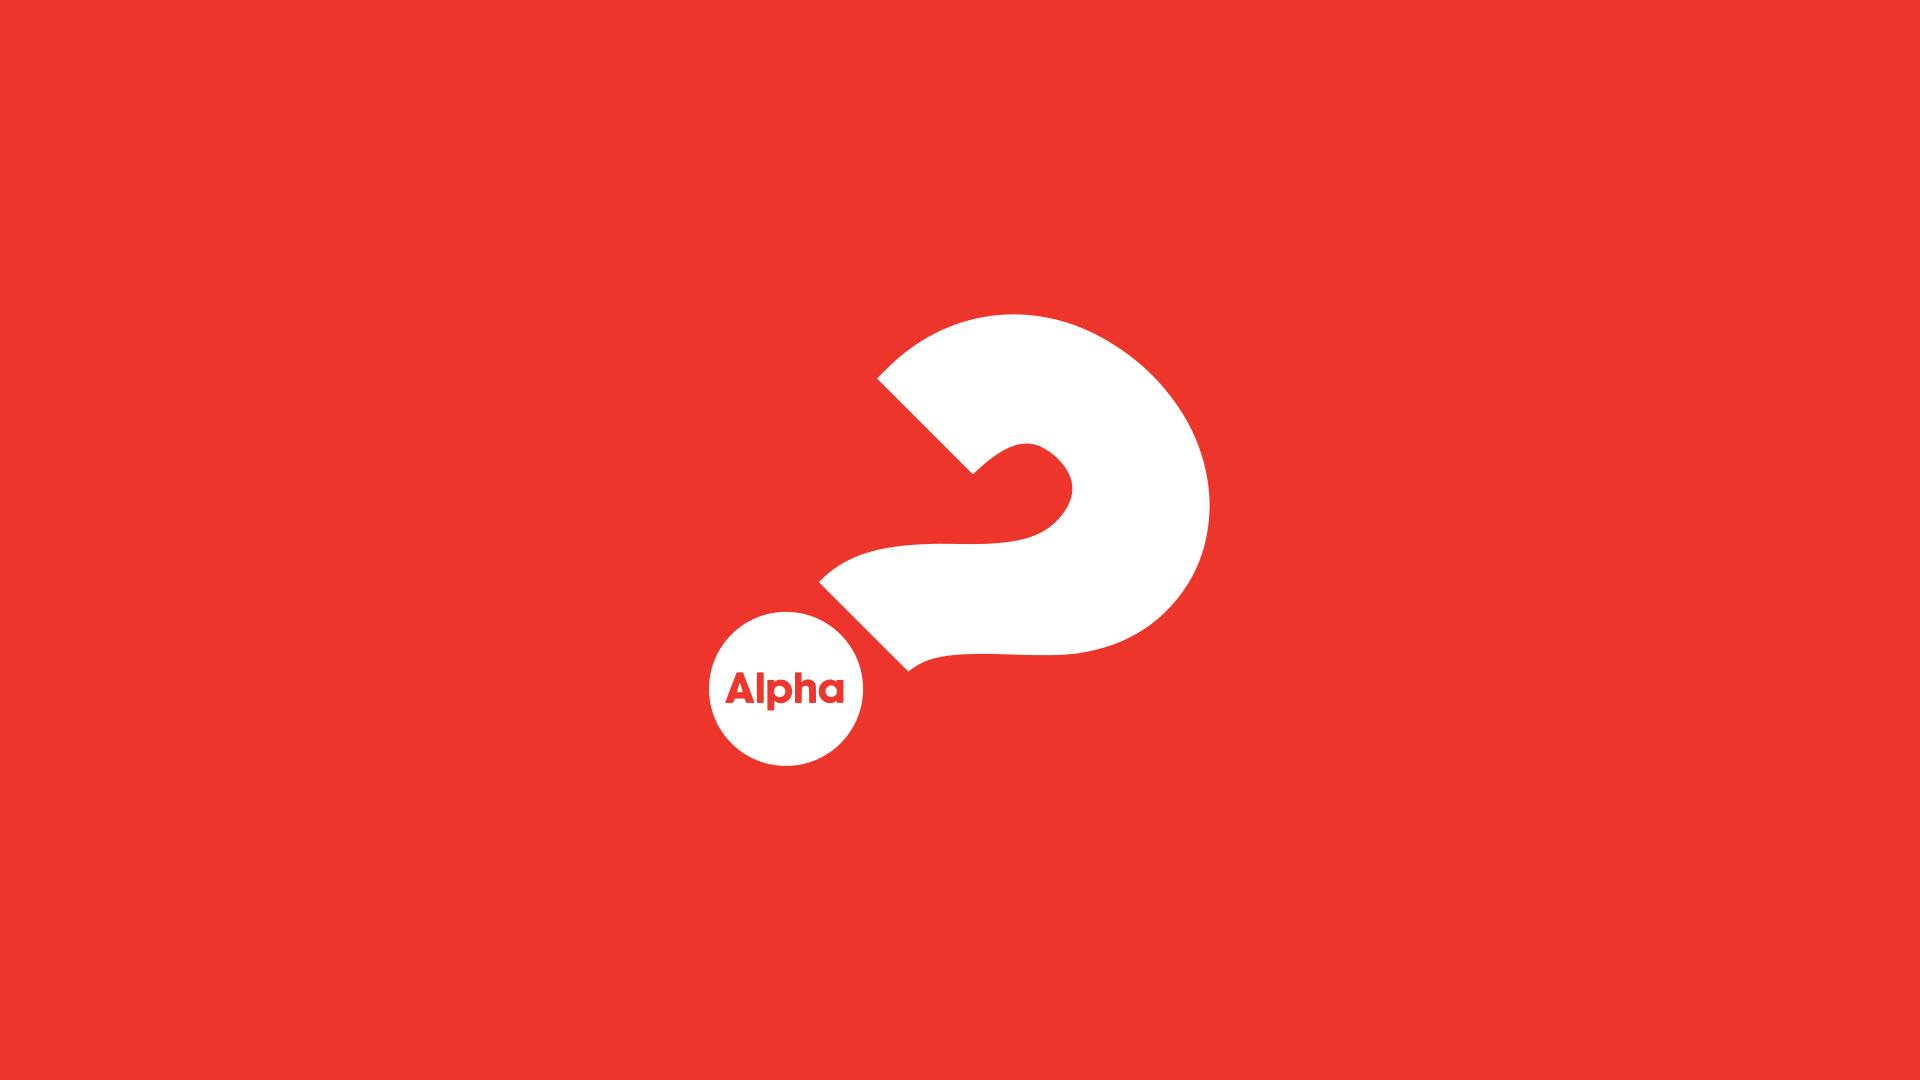 Alpha Red Banner.jpg